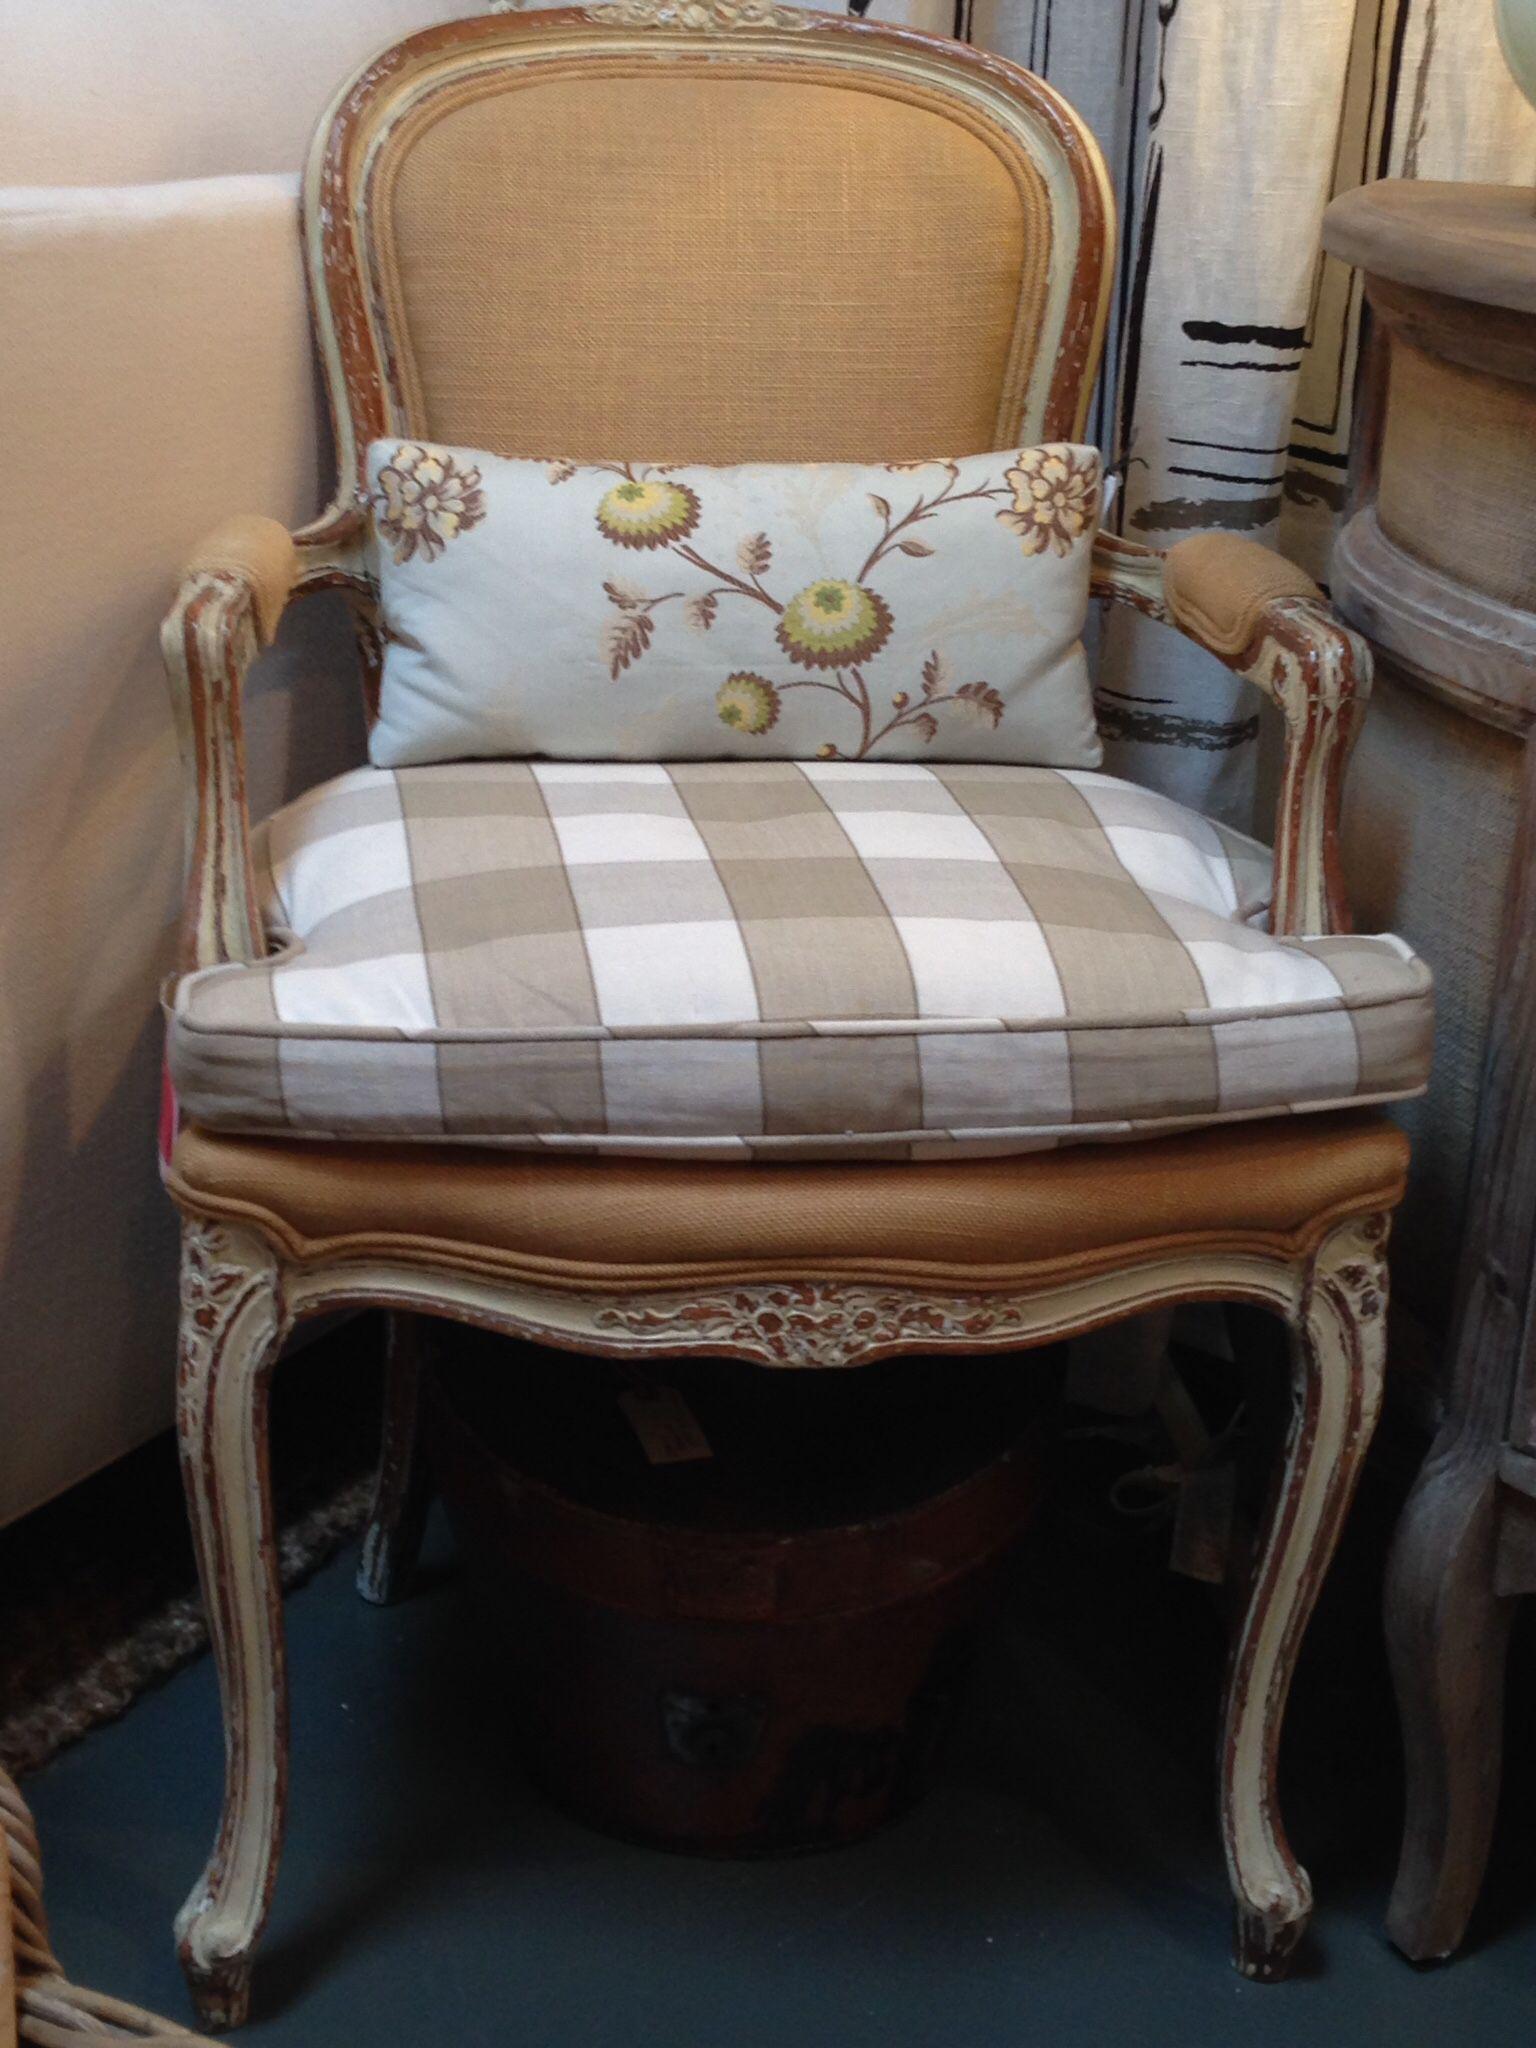 Beau Change The Seat Cushion, Change The Chair